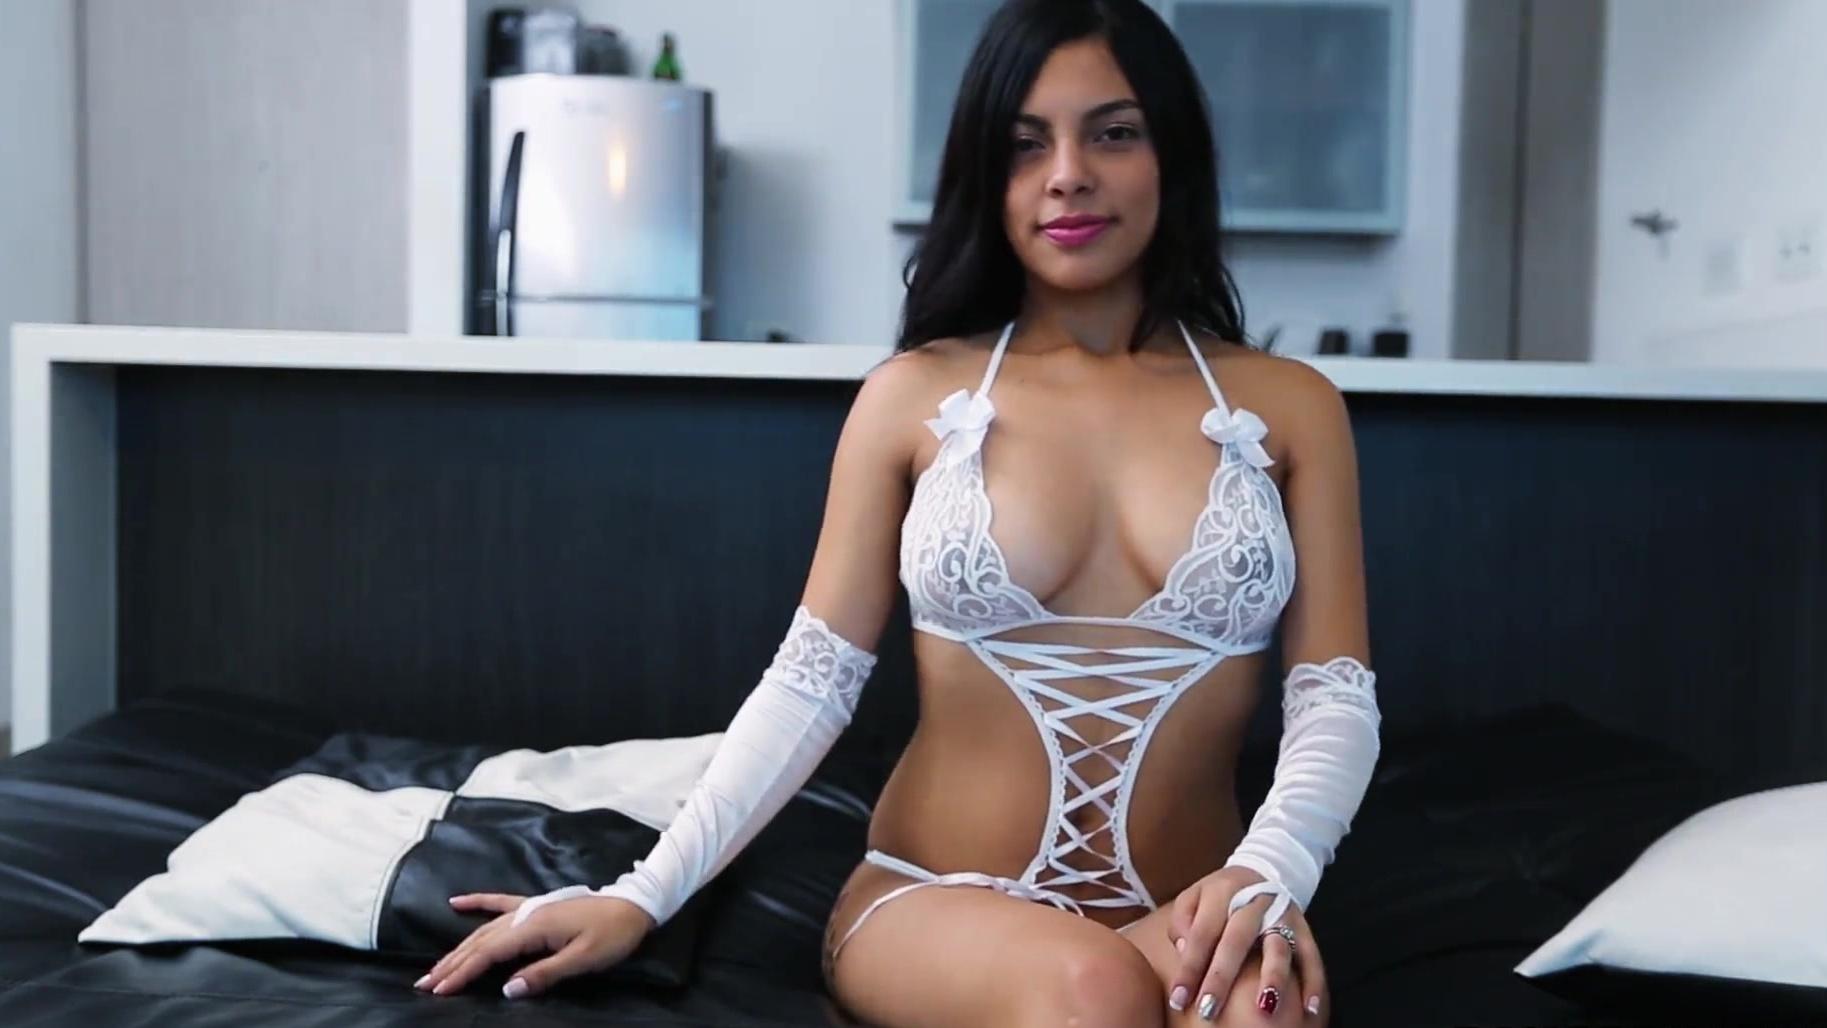 Valeria marin porn